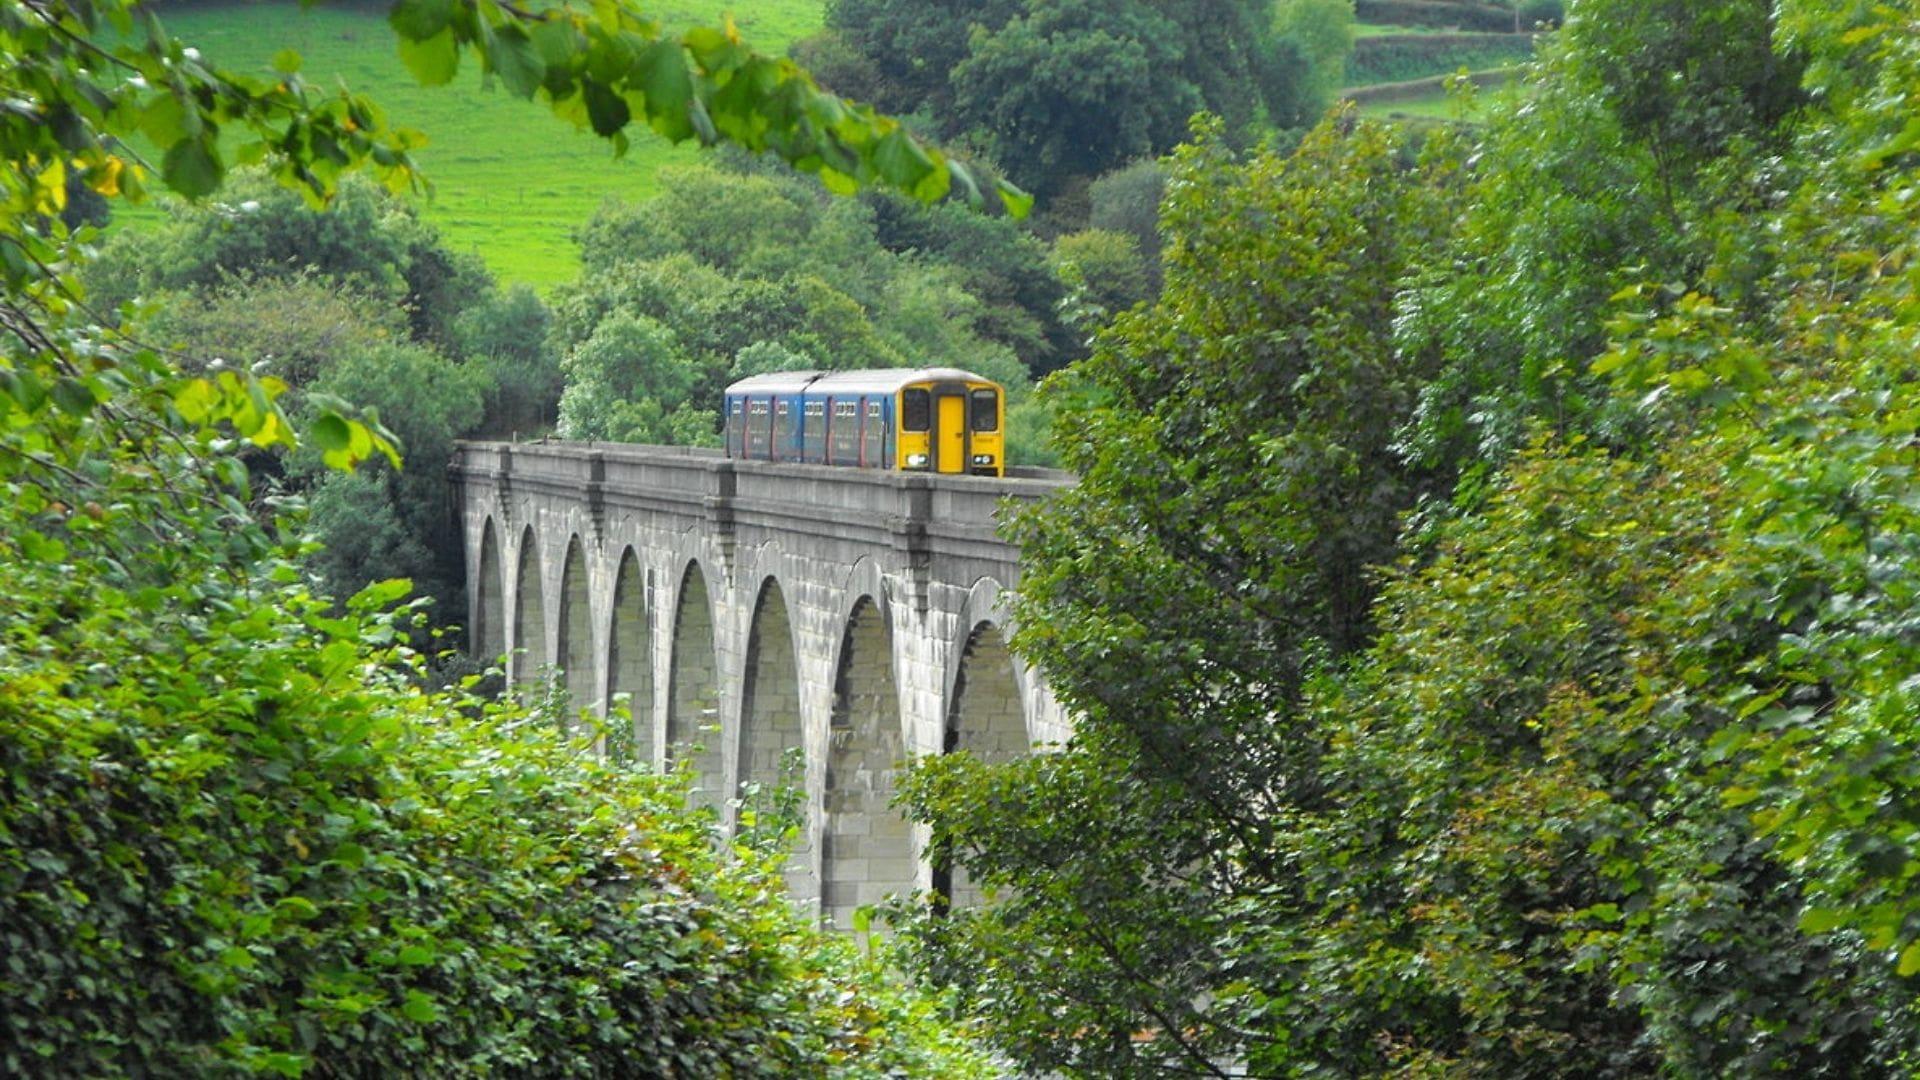 An-Insiders-Guide-to-Cornwall-Tamar-and-Looe-Calstock-Vidauct-Cornish-Motorhome-Hire